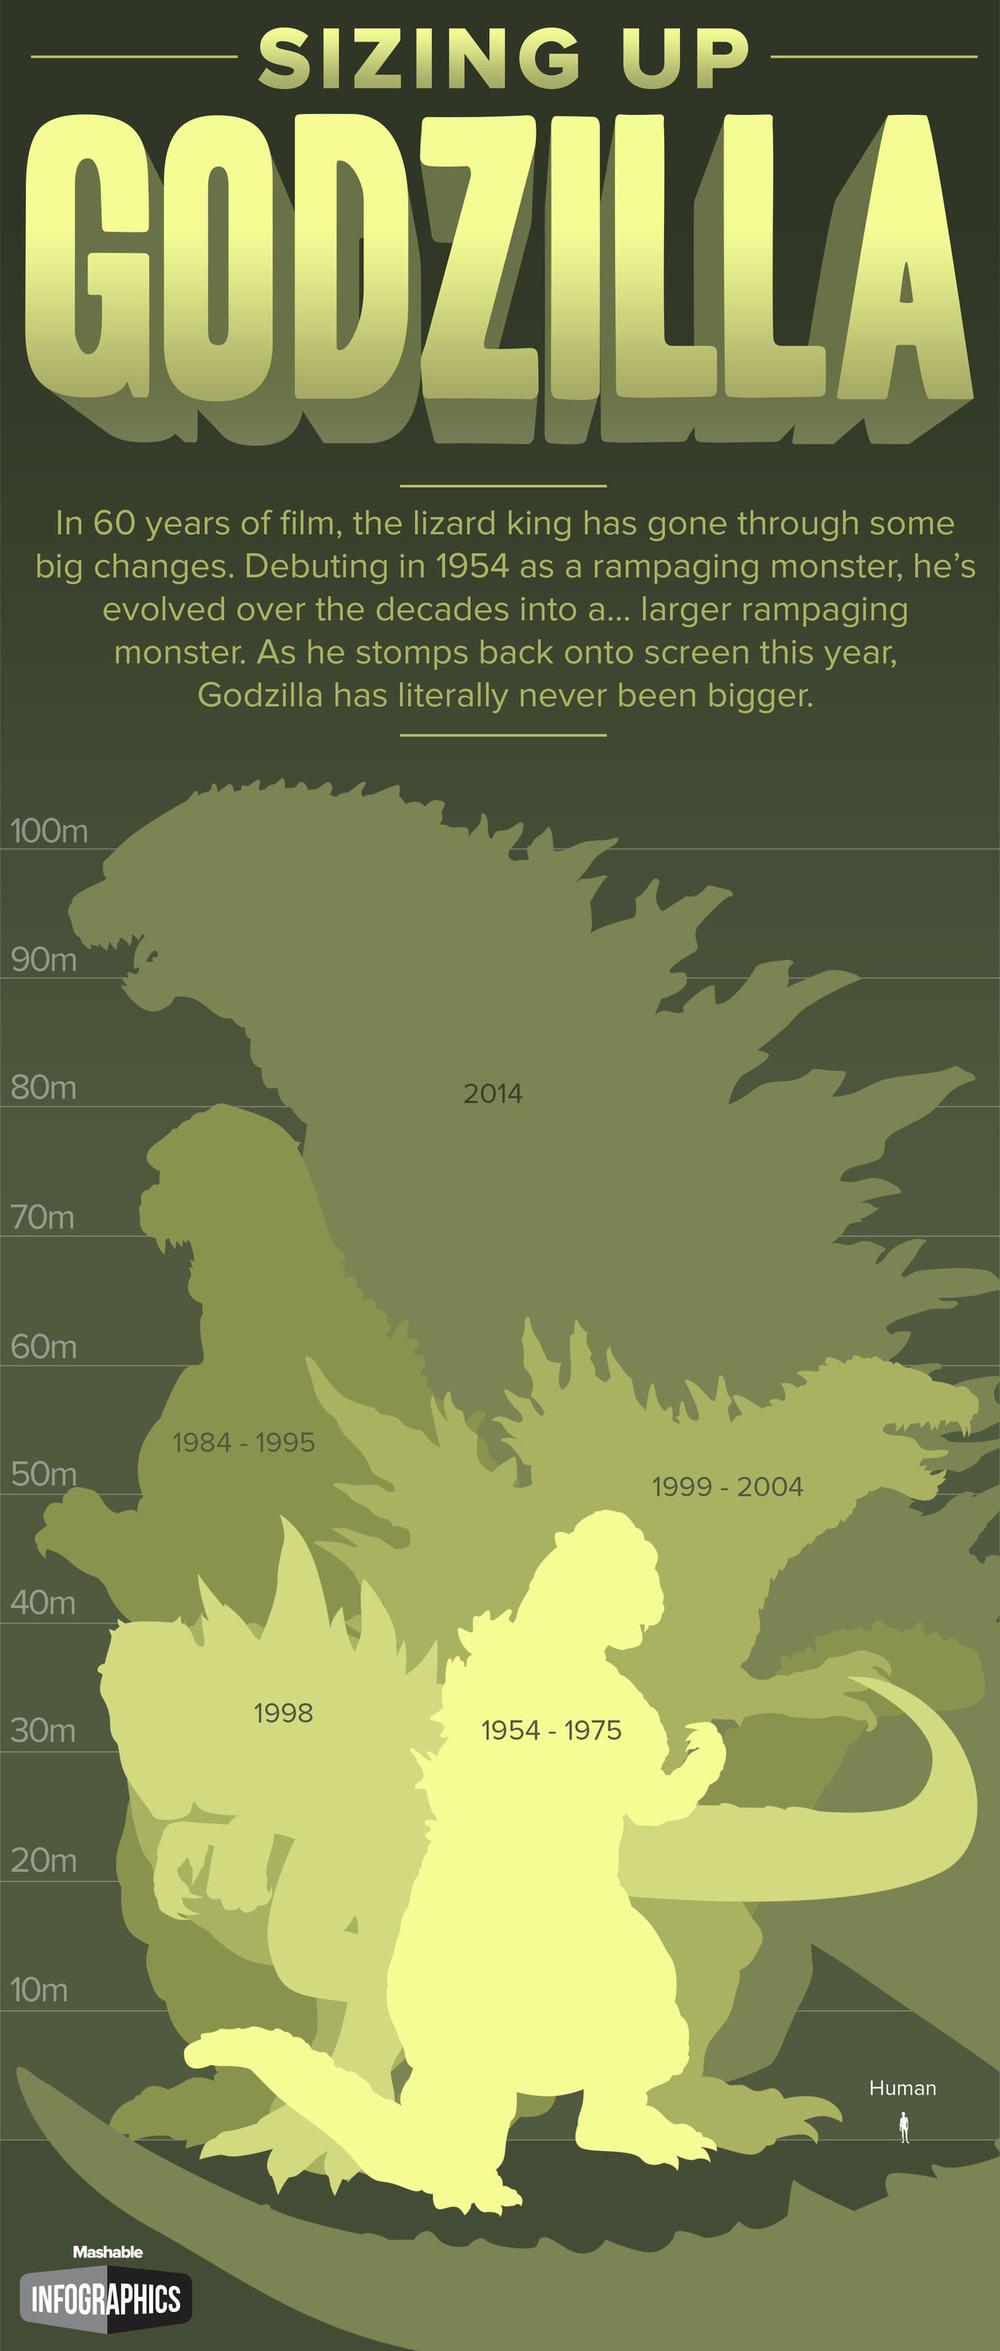 Godzilla-Infographic.jpg